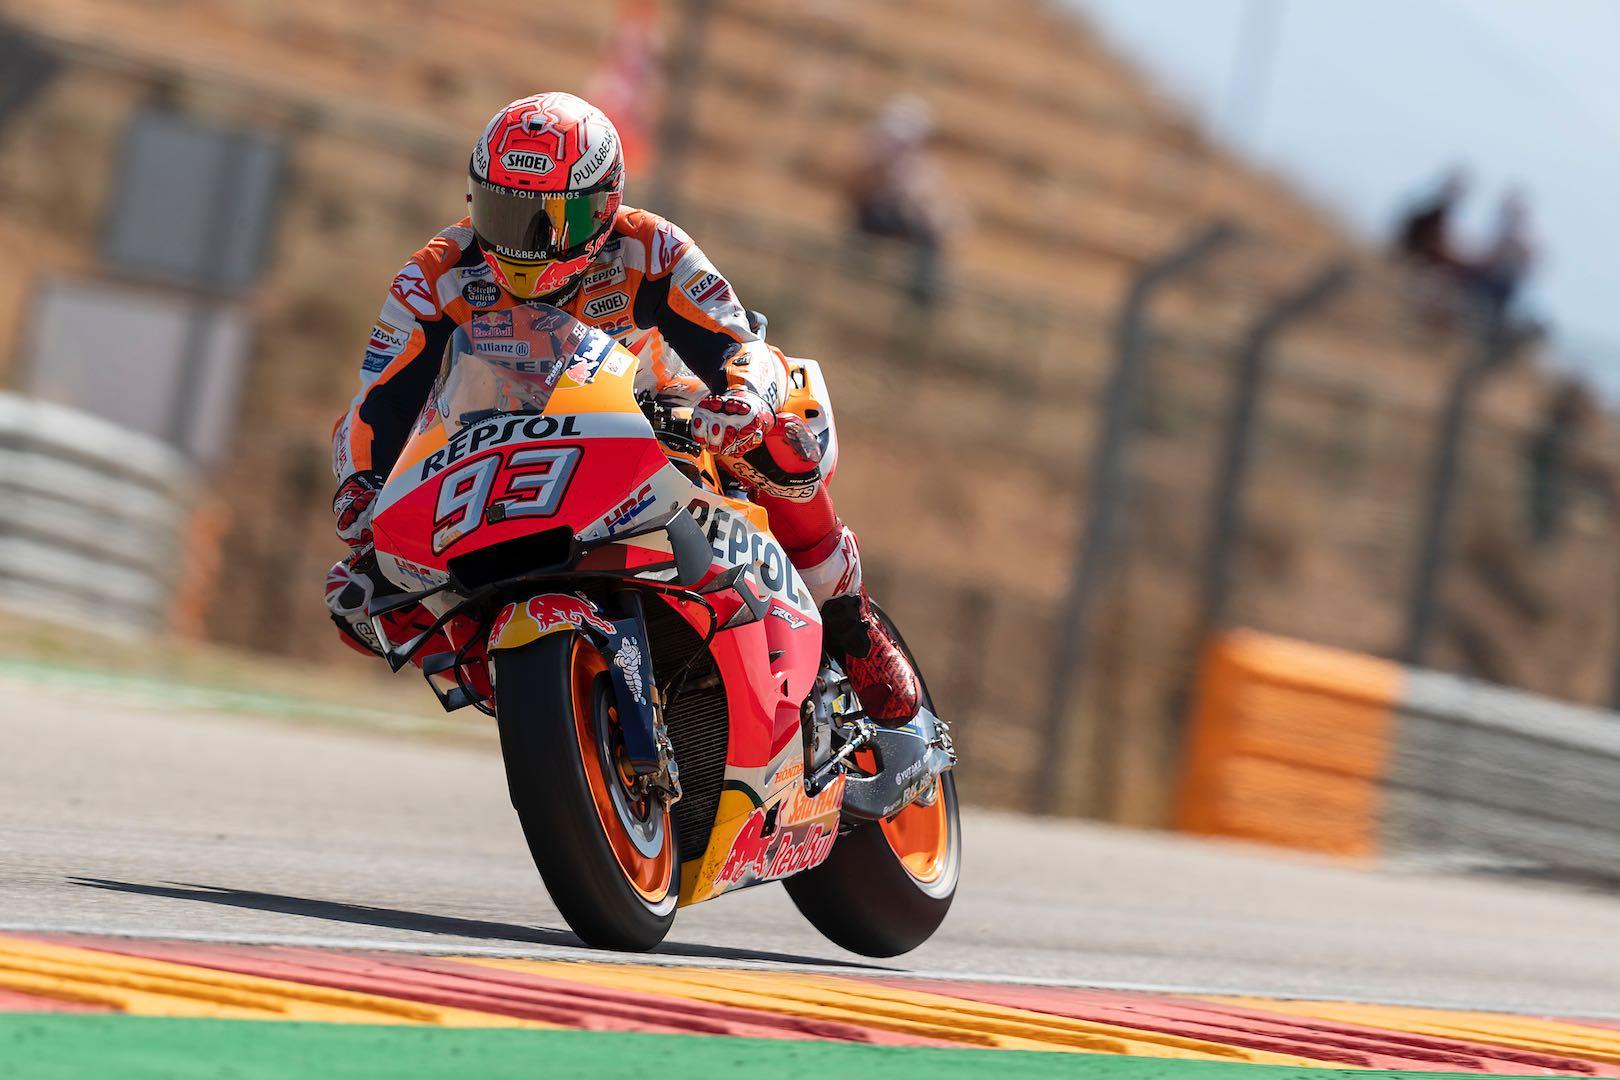 2019 Aragon Motogp Qualifying Results Marquez Claims Pole 9